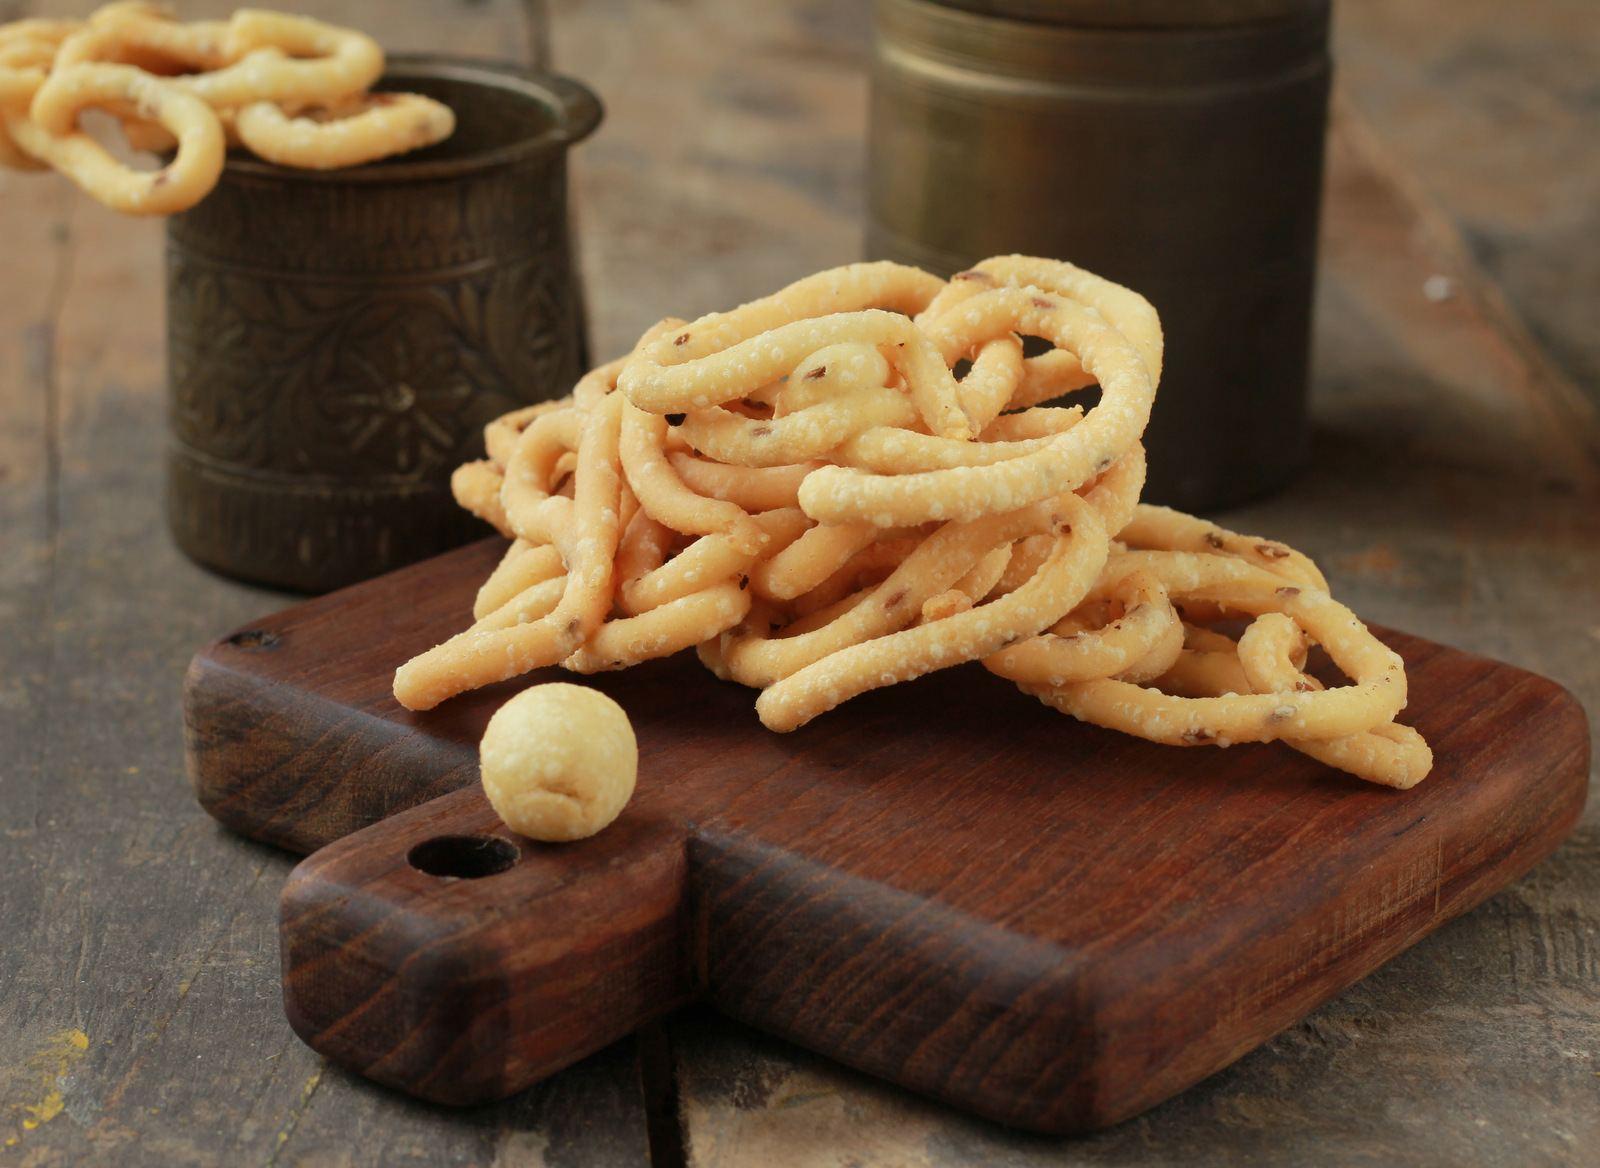 Thenkuzal Recipe South Indian Snack Using Rice Flour Amp Urad Dal Flour By Archana S Kitchen